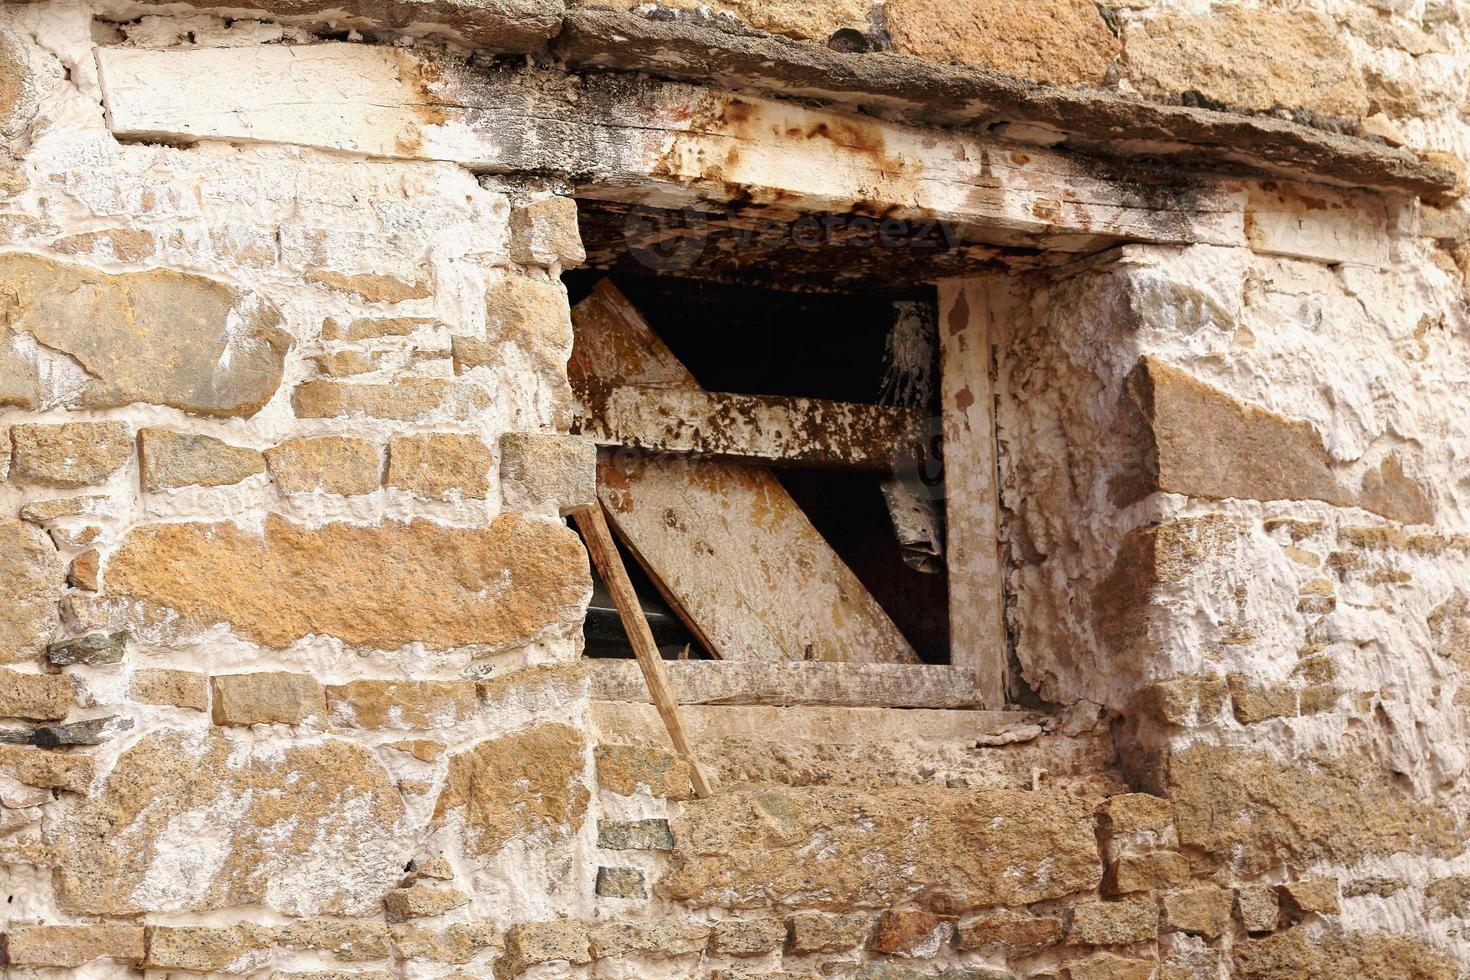 struttura in legno di muro di pietra-finestra in rovina. monastero di drepung-lhasa-cina. 1249 foto